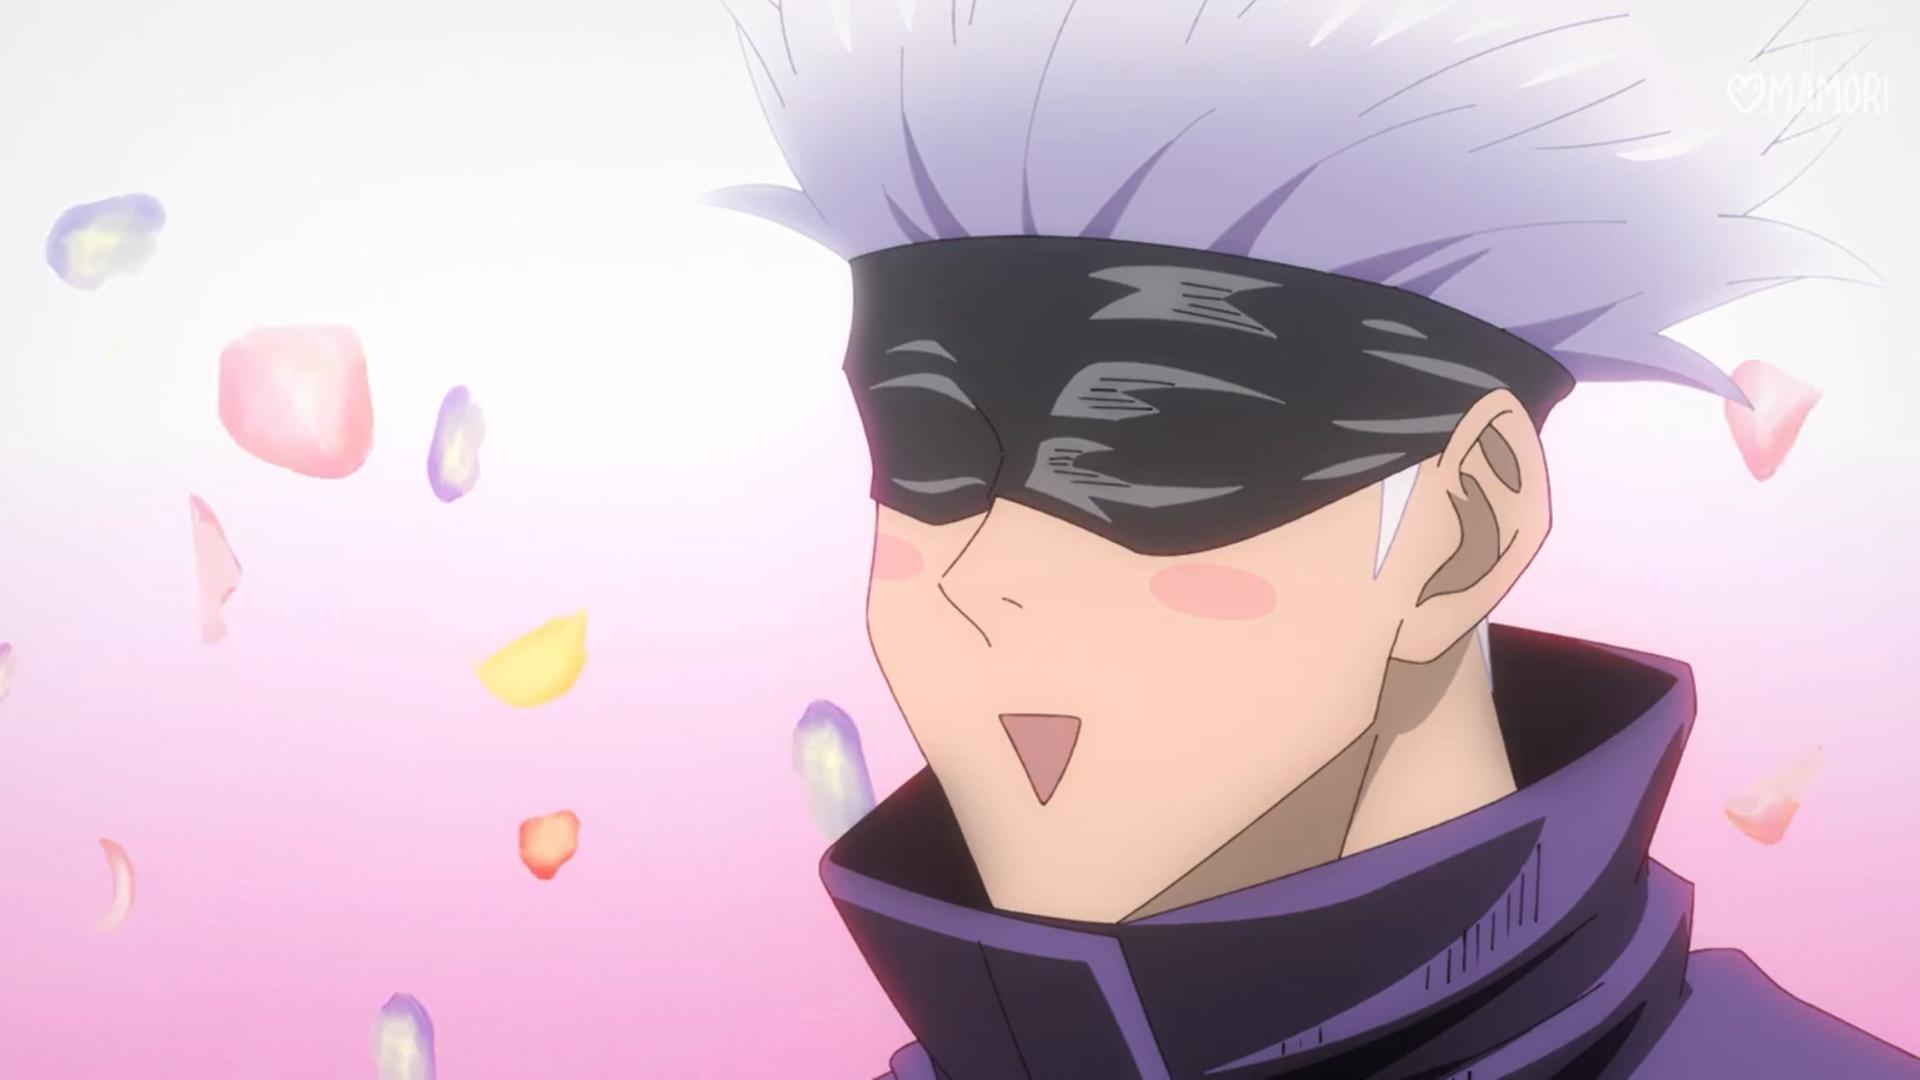 Gojo Love Flower 3 Jujutsu Anime Anime Heaven